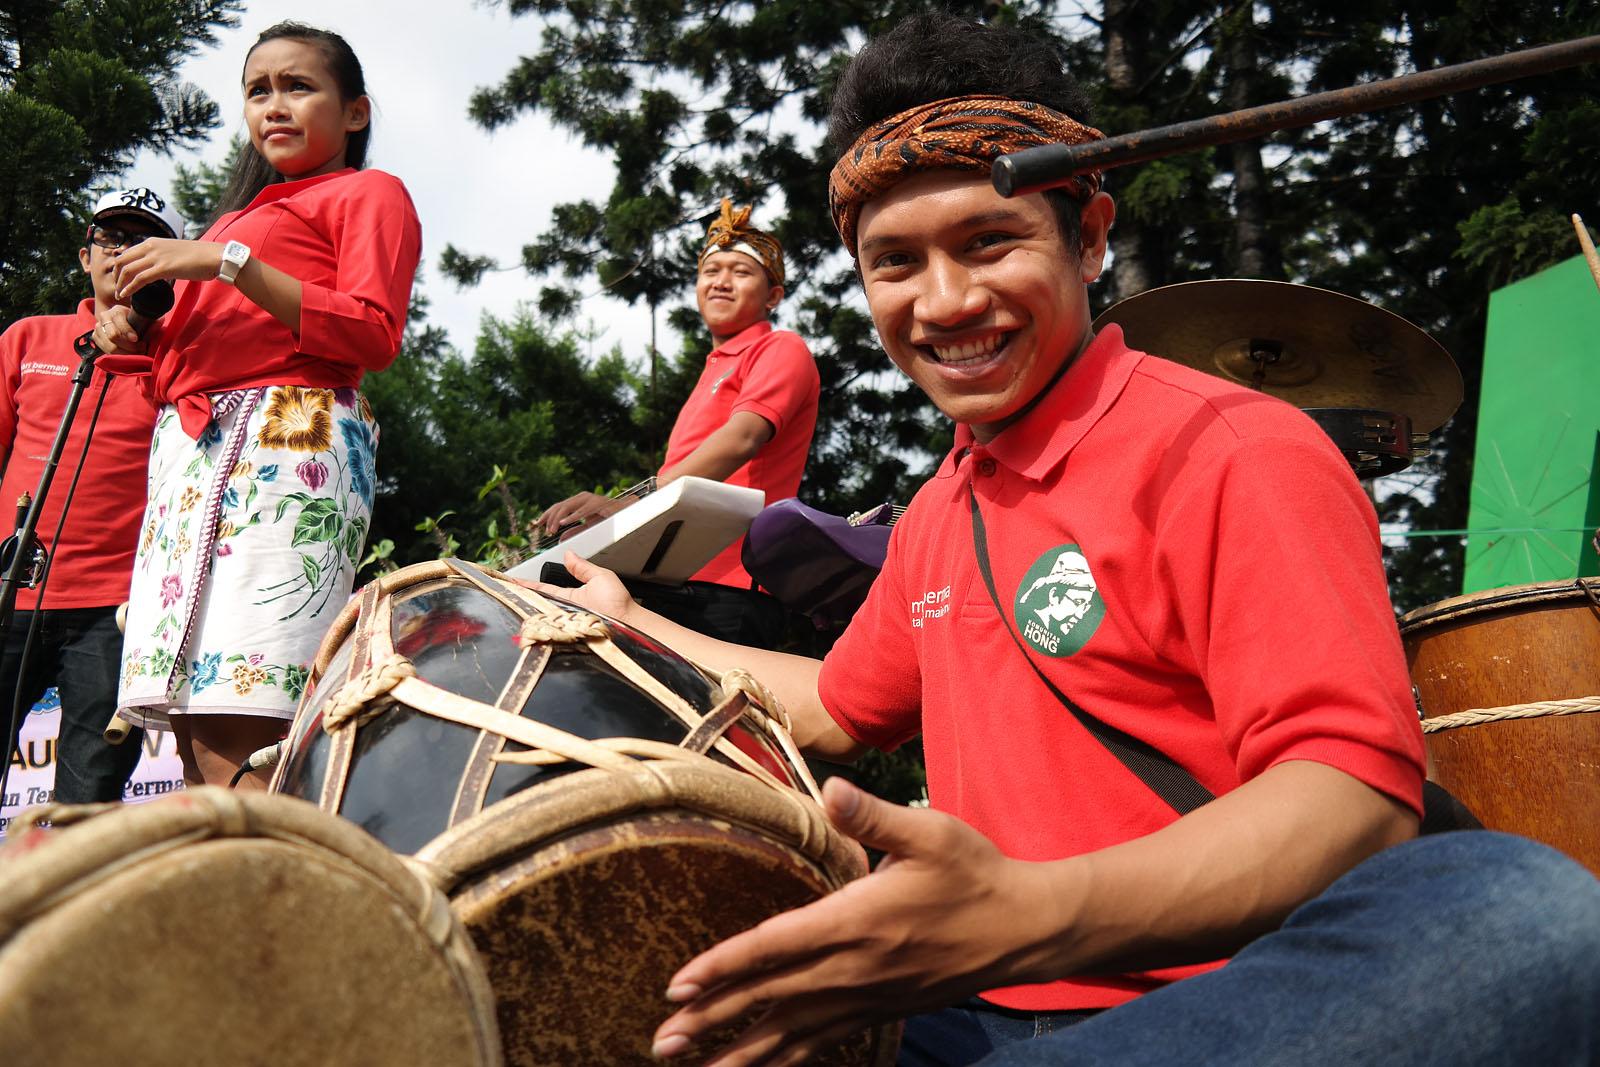 """Rampak Gendang"" -- salah satu kesenian musik dari Jawa Barat | 18mm, 1/640, f/4, iso 100."